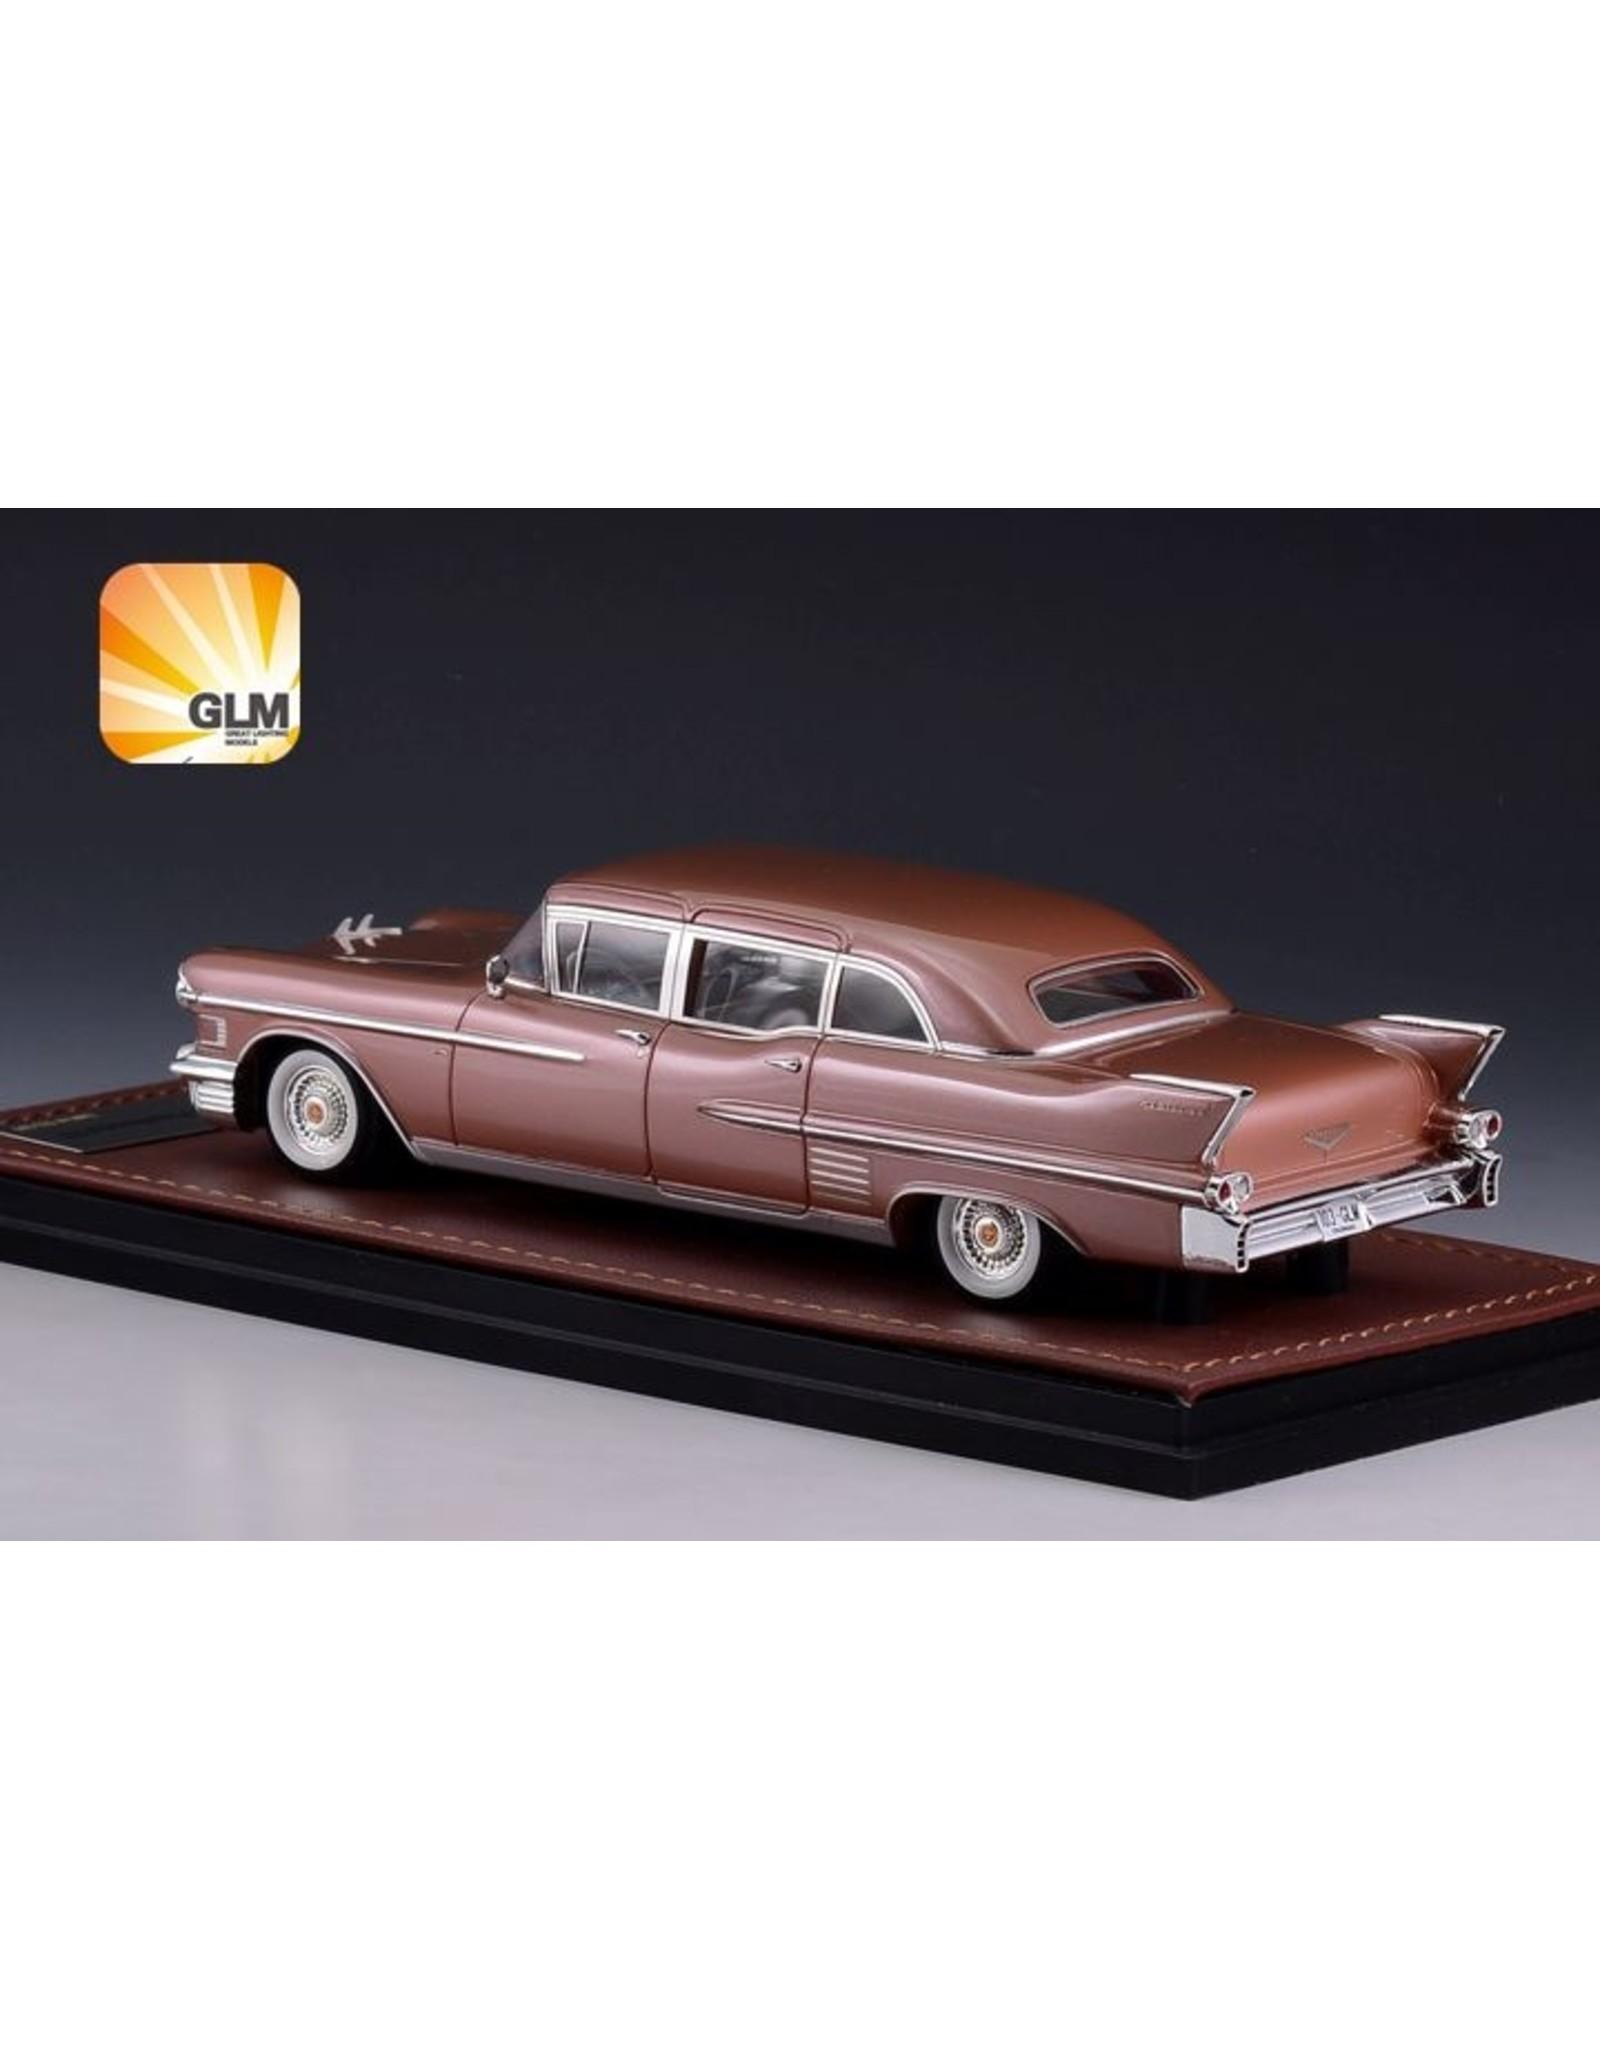 Cadillac(General Motors) Cadillac Fleetwood 75 Limousine(1958)desert bronze metallic.